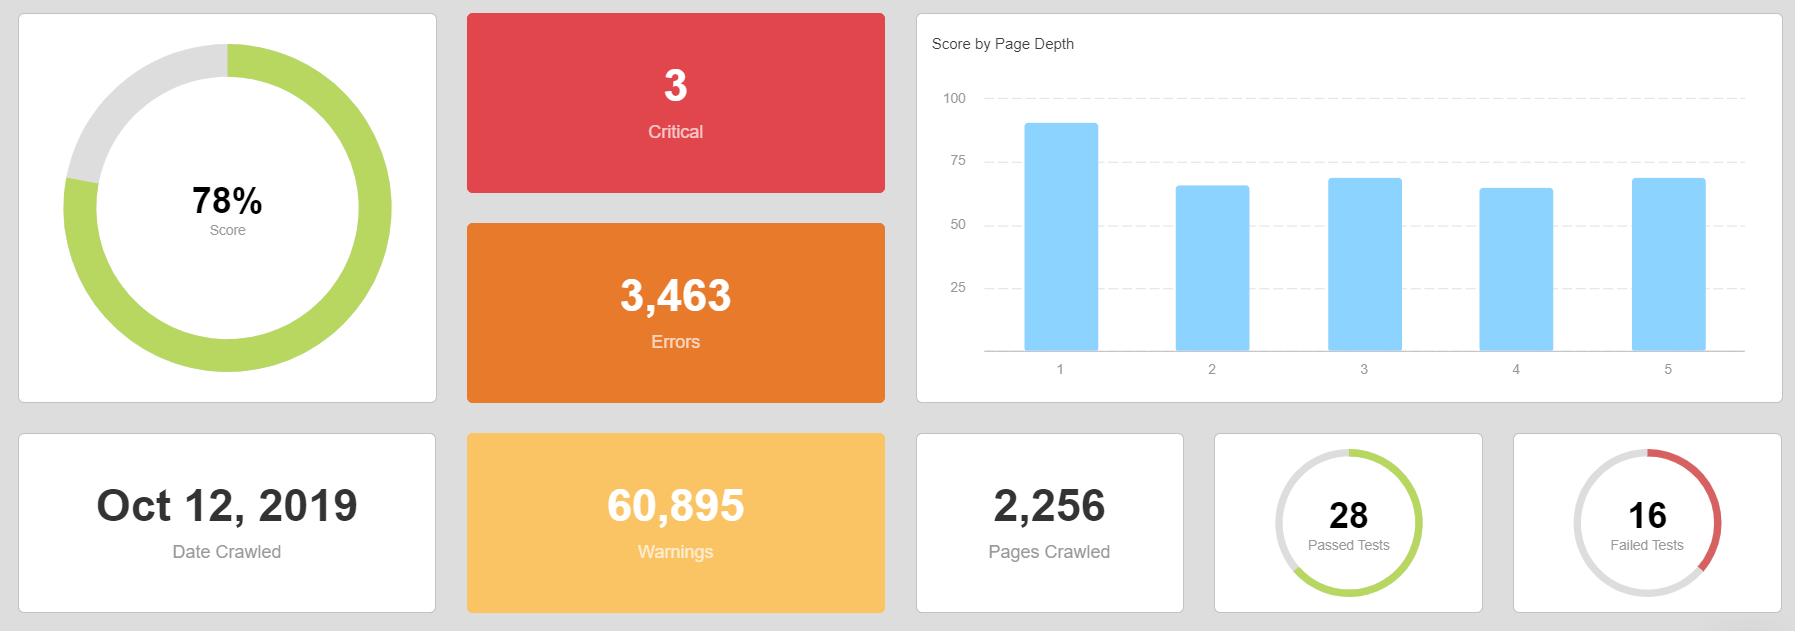 FFM Site Auditor Results 10.12.19